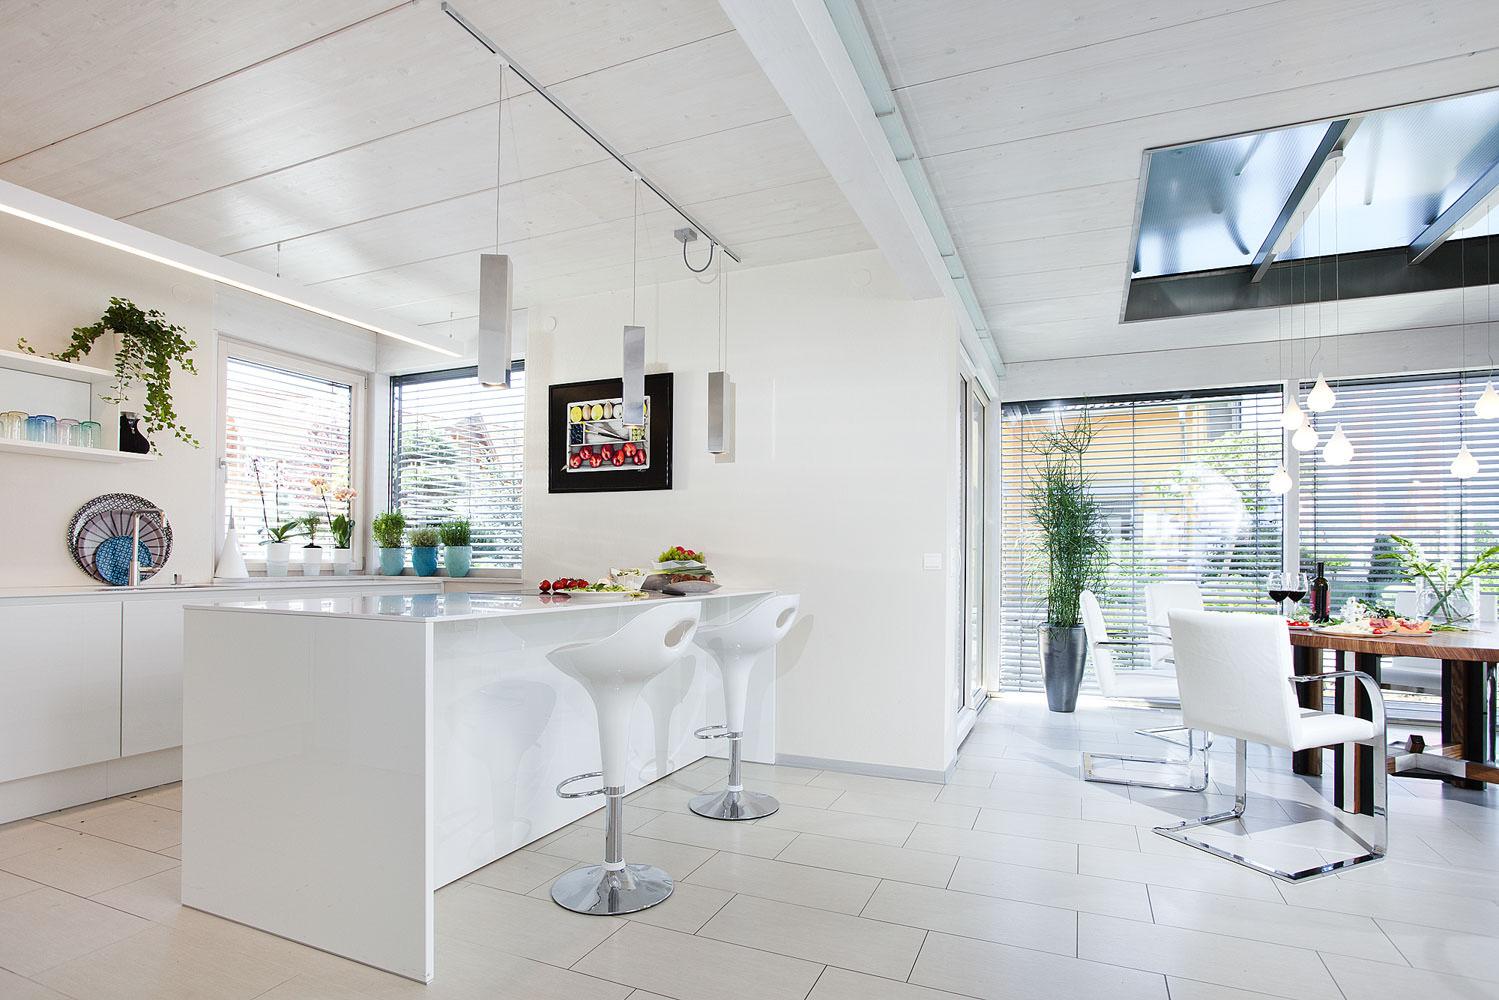 interiorfotografie_ haus_graz_interior design_1139.jpg